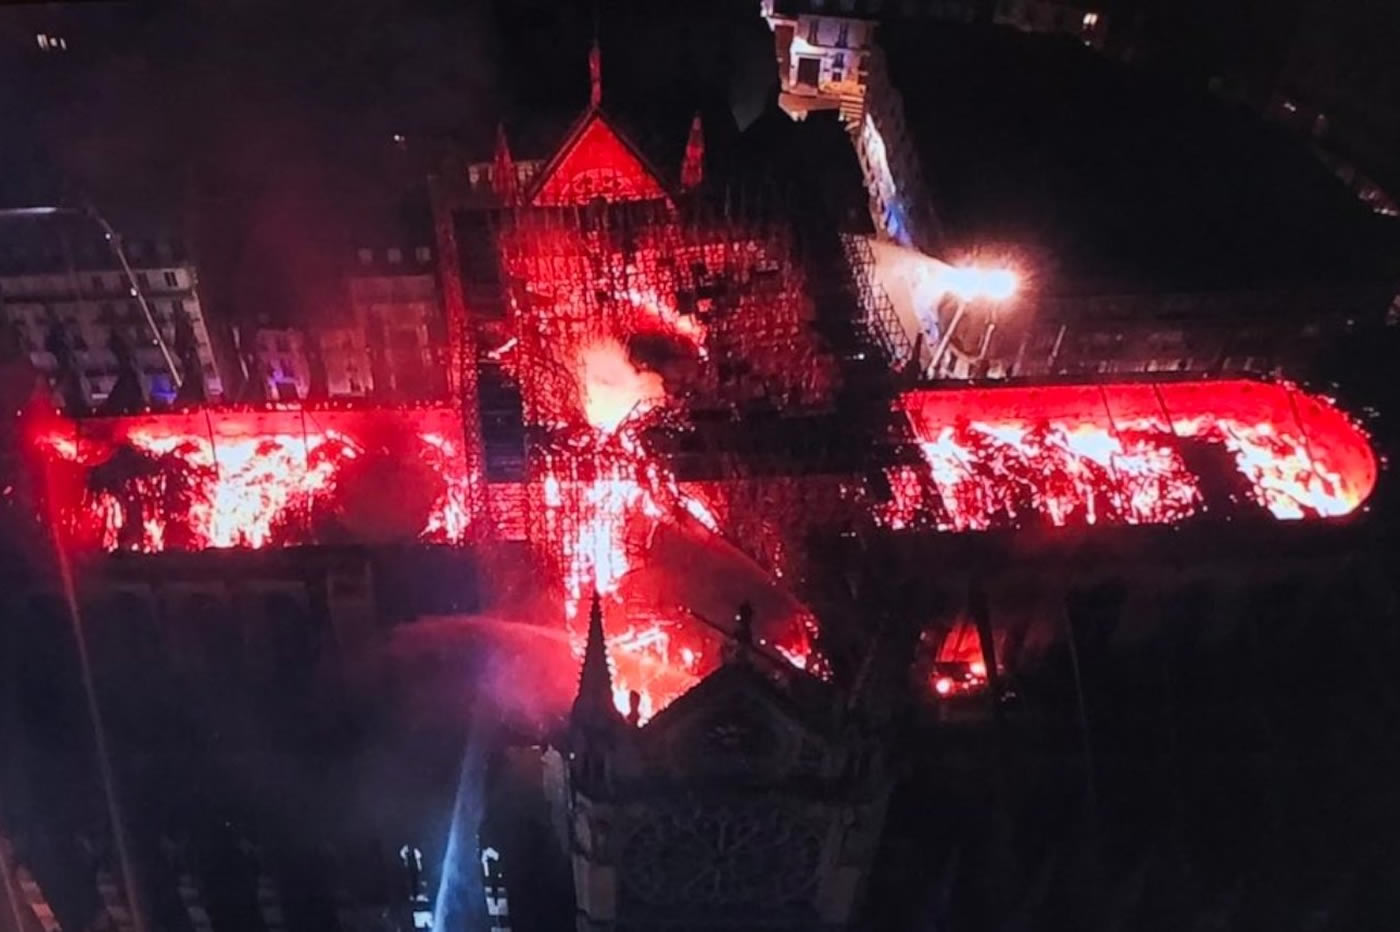 Incendie Notre-Dame drone DJI